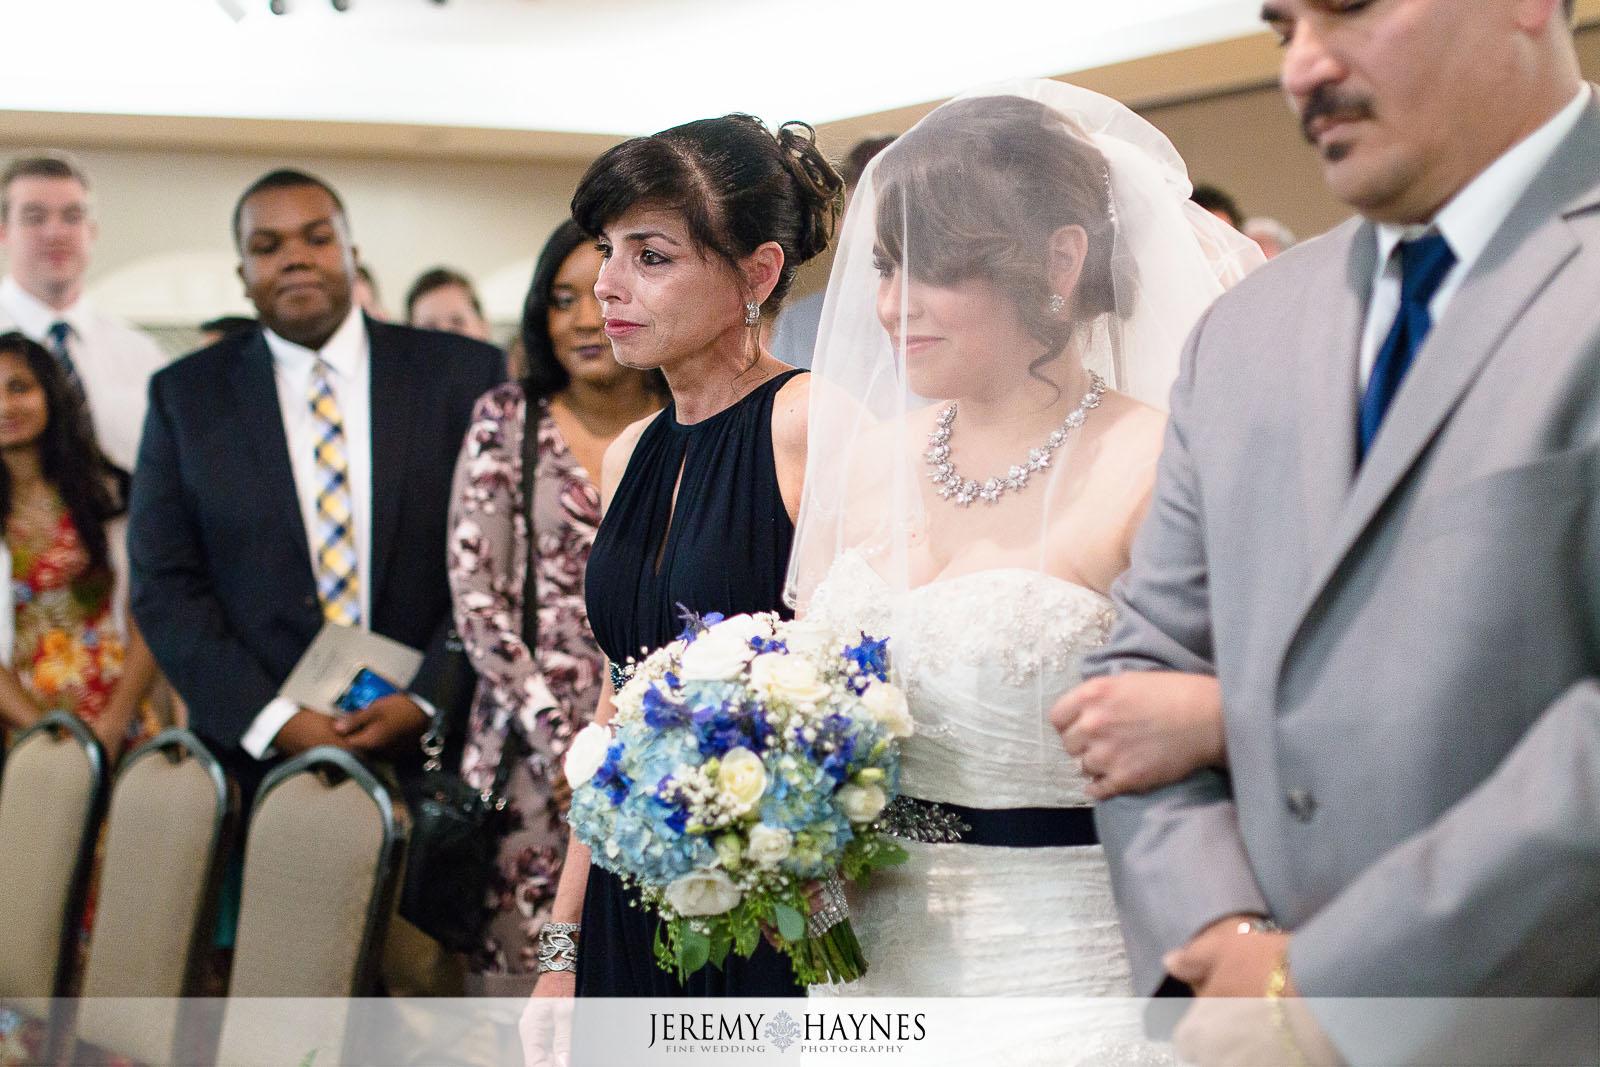 willows-westfield-event-center-indianapolis-bride-wedding-photos